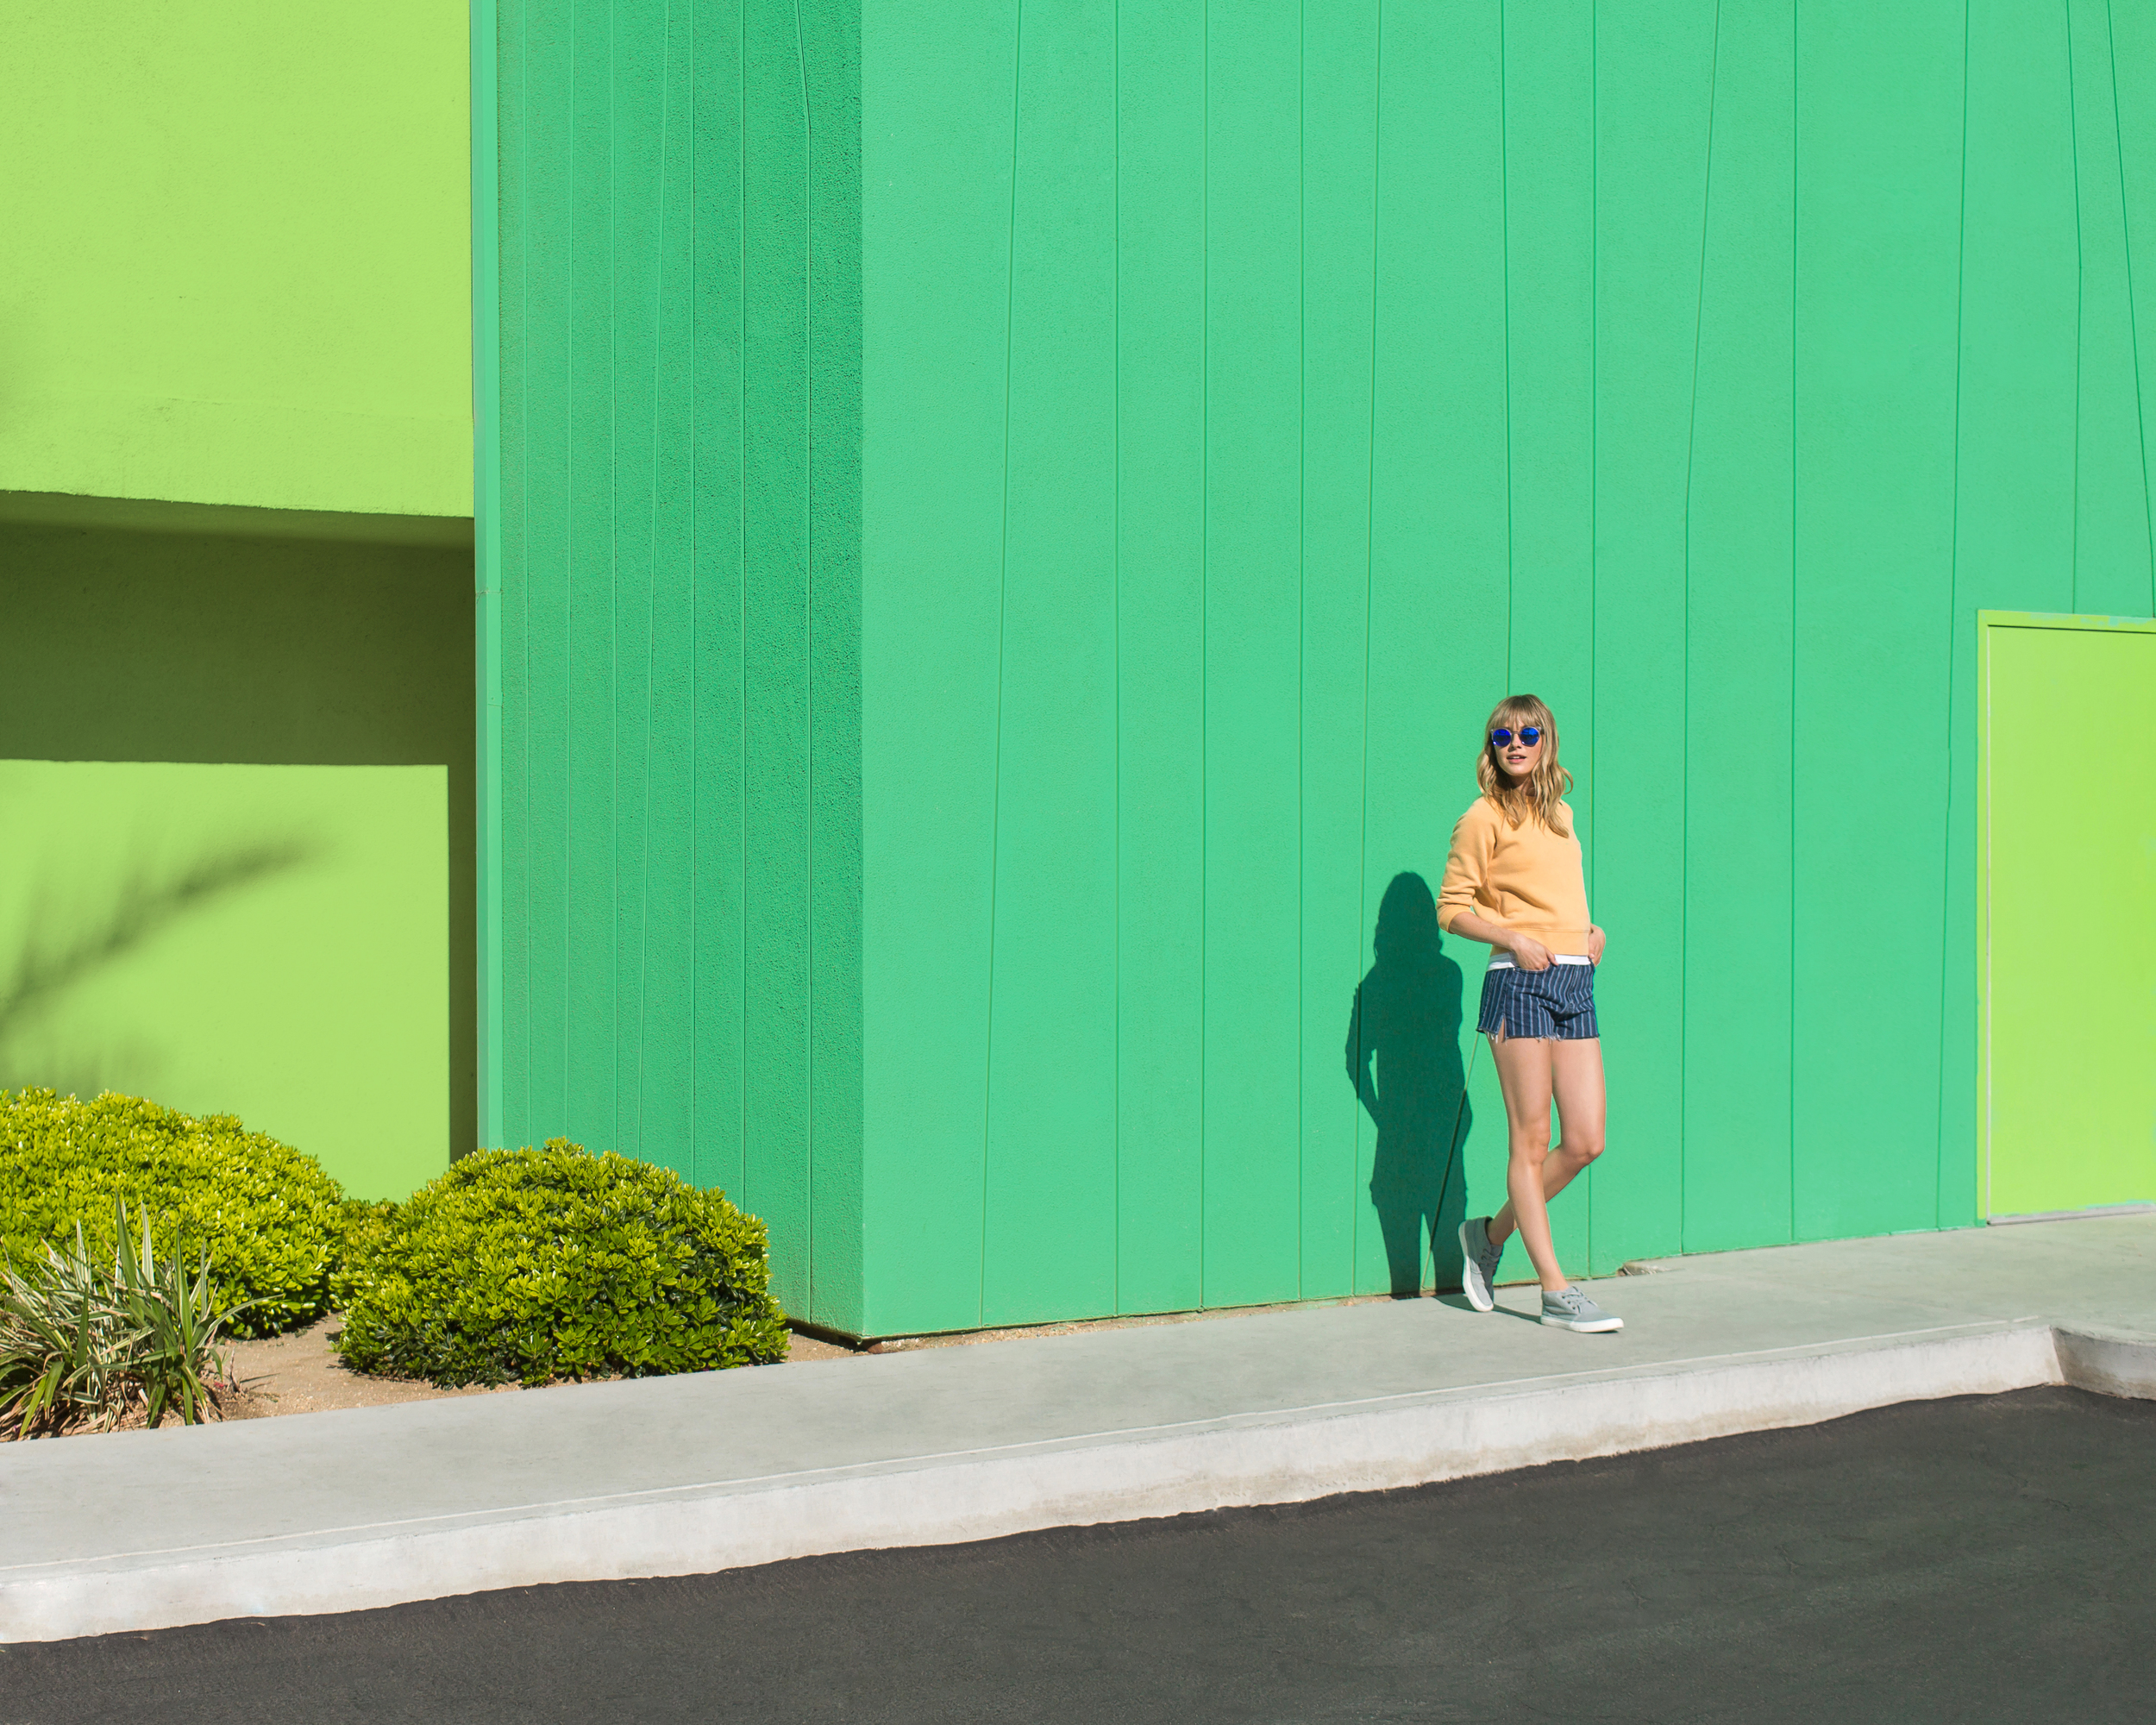 Ashley / Palm Springs, CA / March 2016